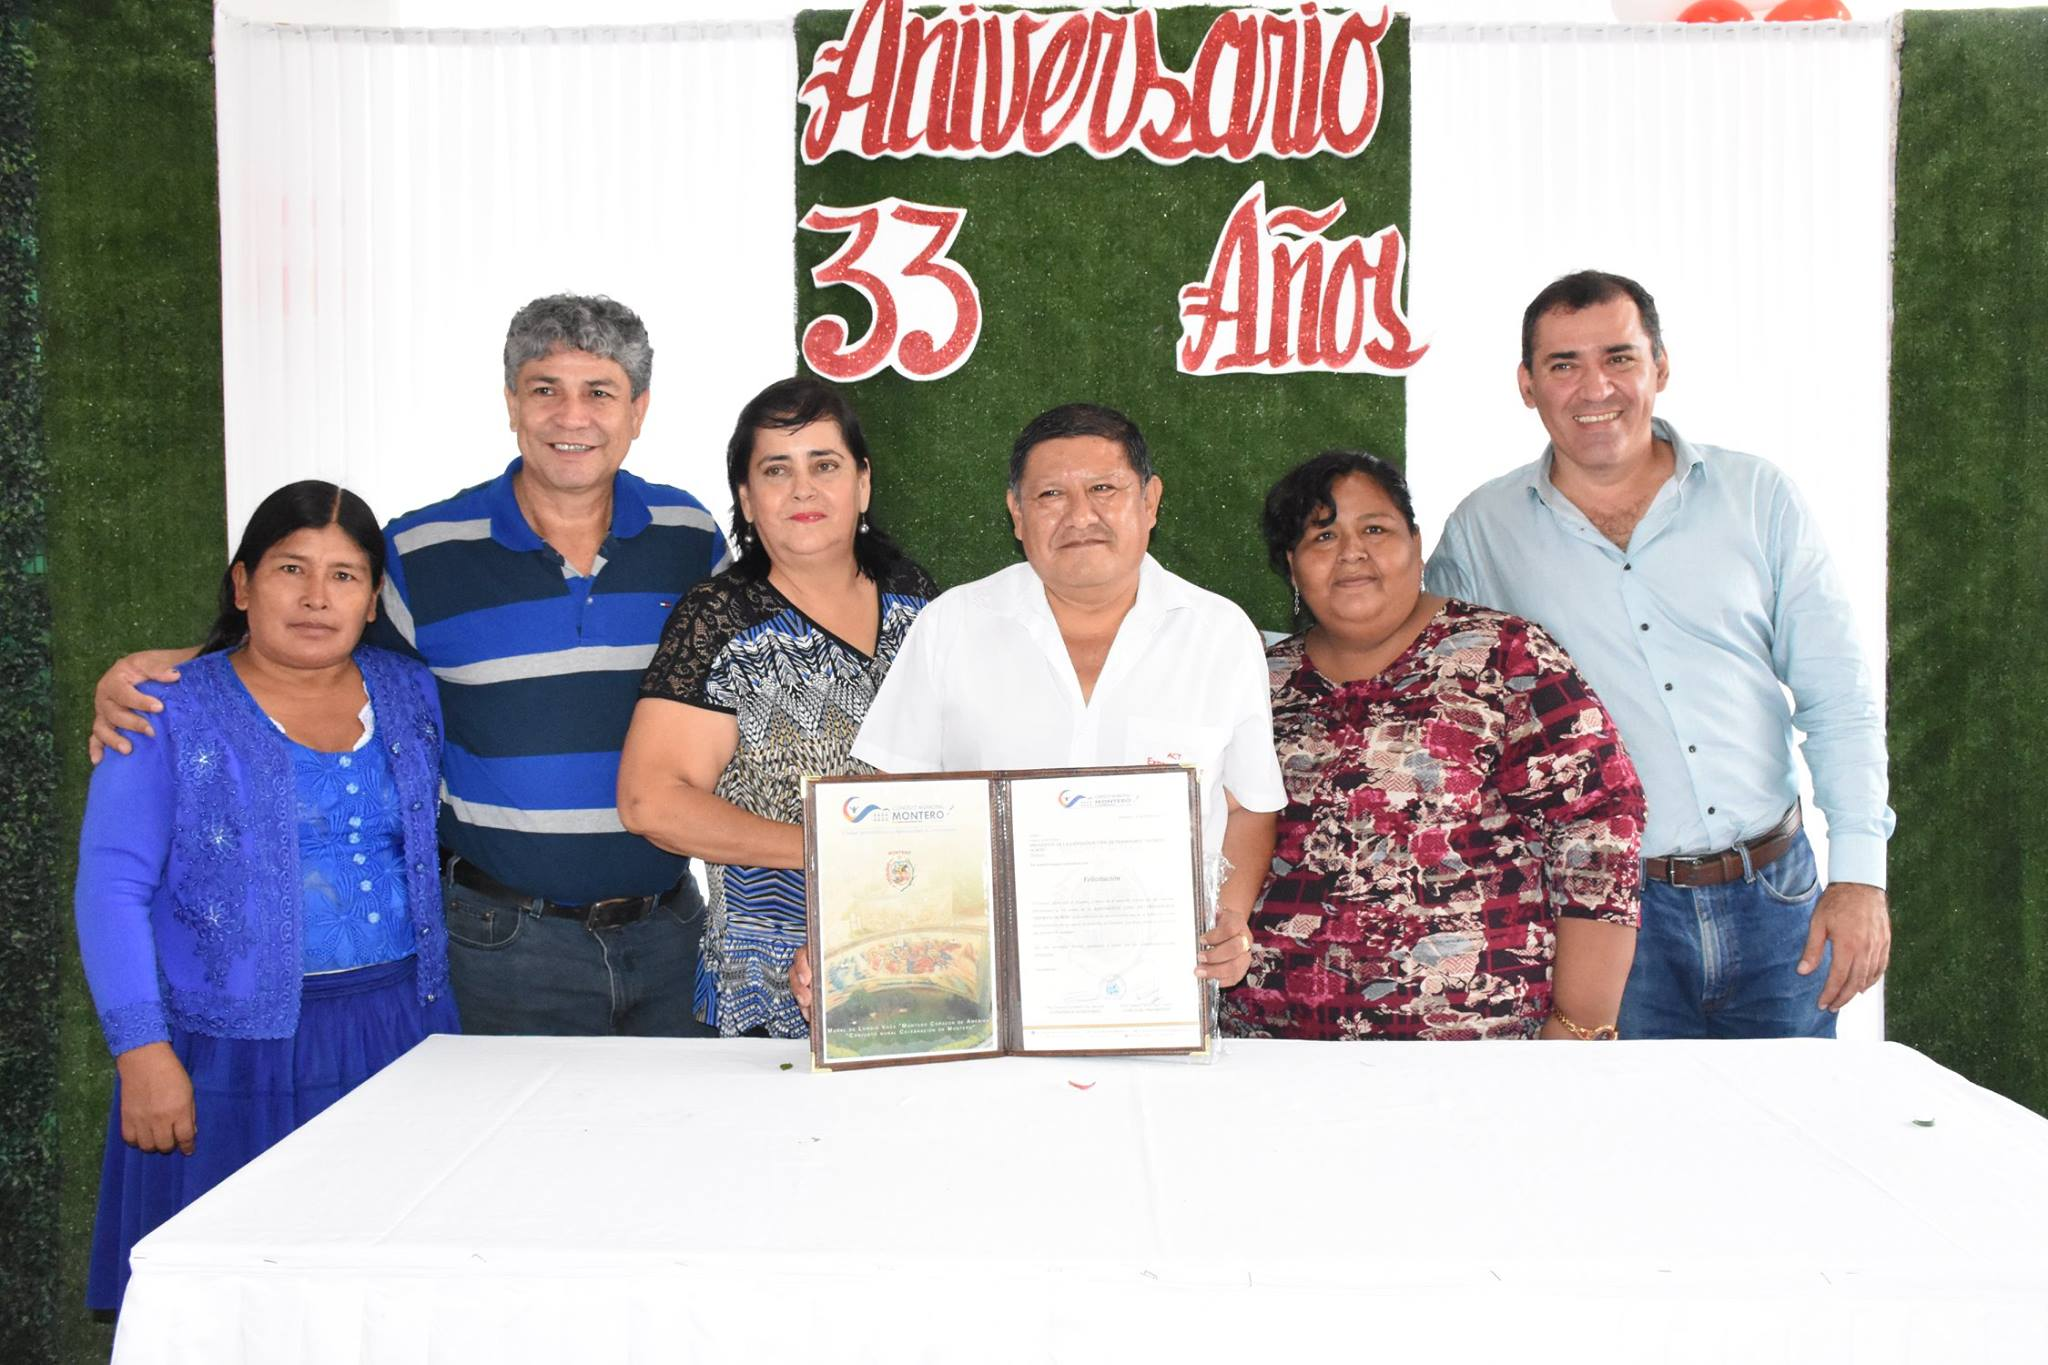 """Expreso Norte"" celebra su 33 aniversario"